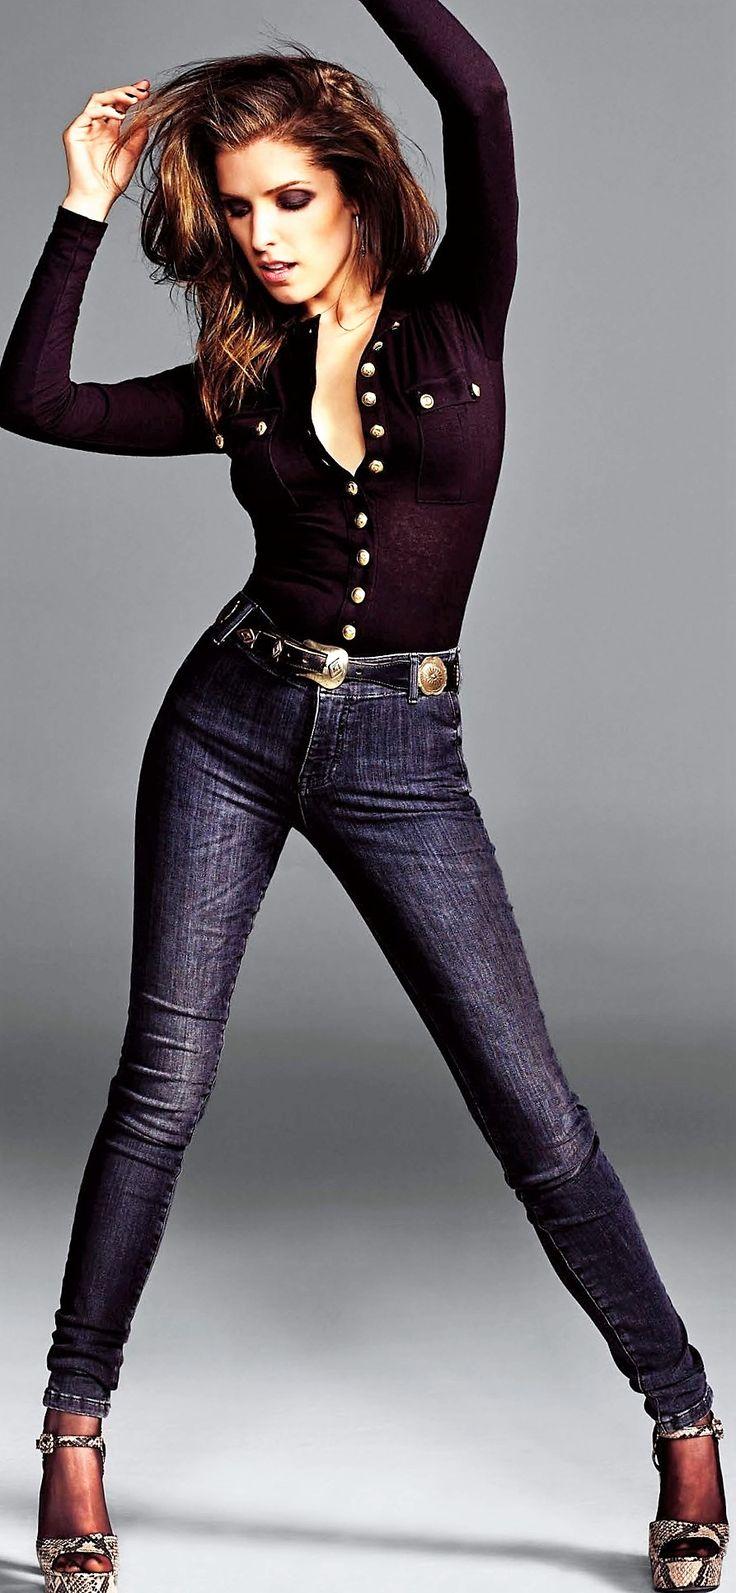 Anna Kendrick Body